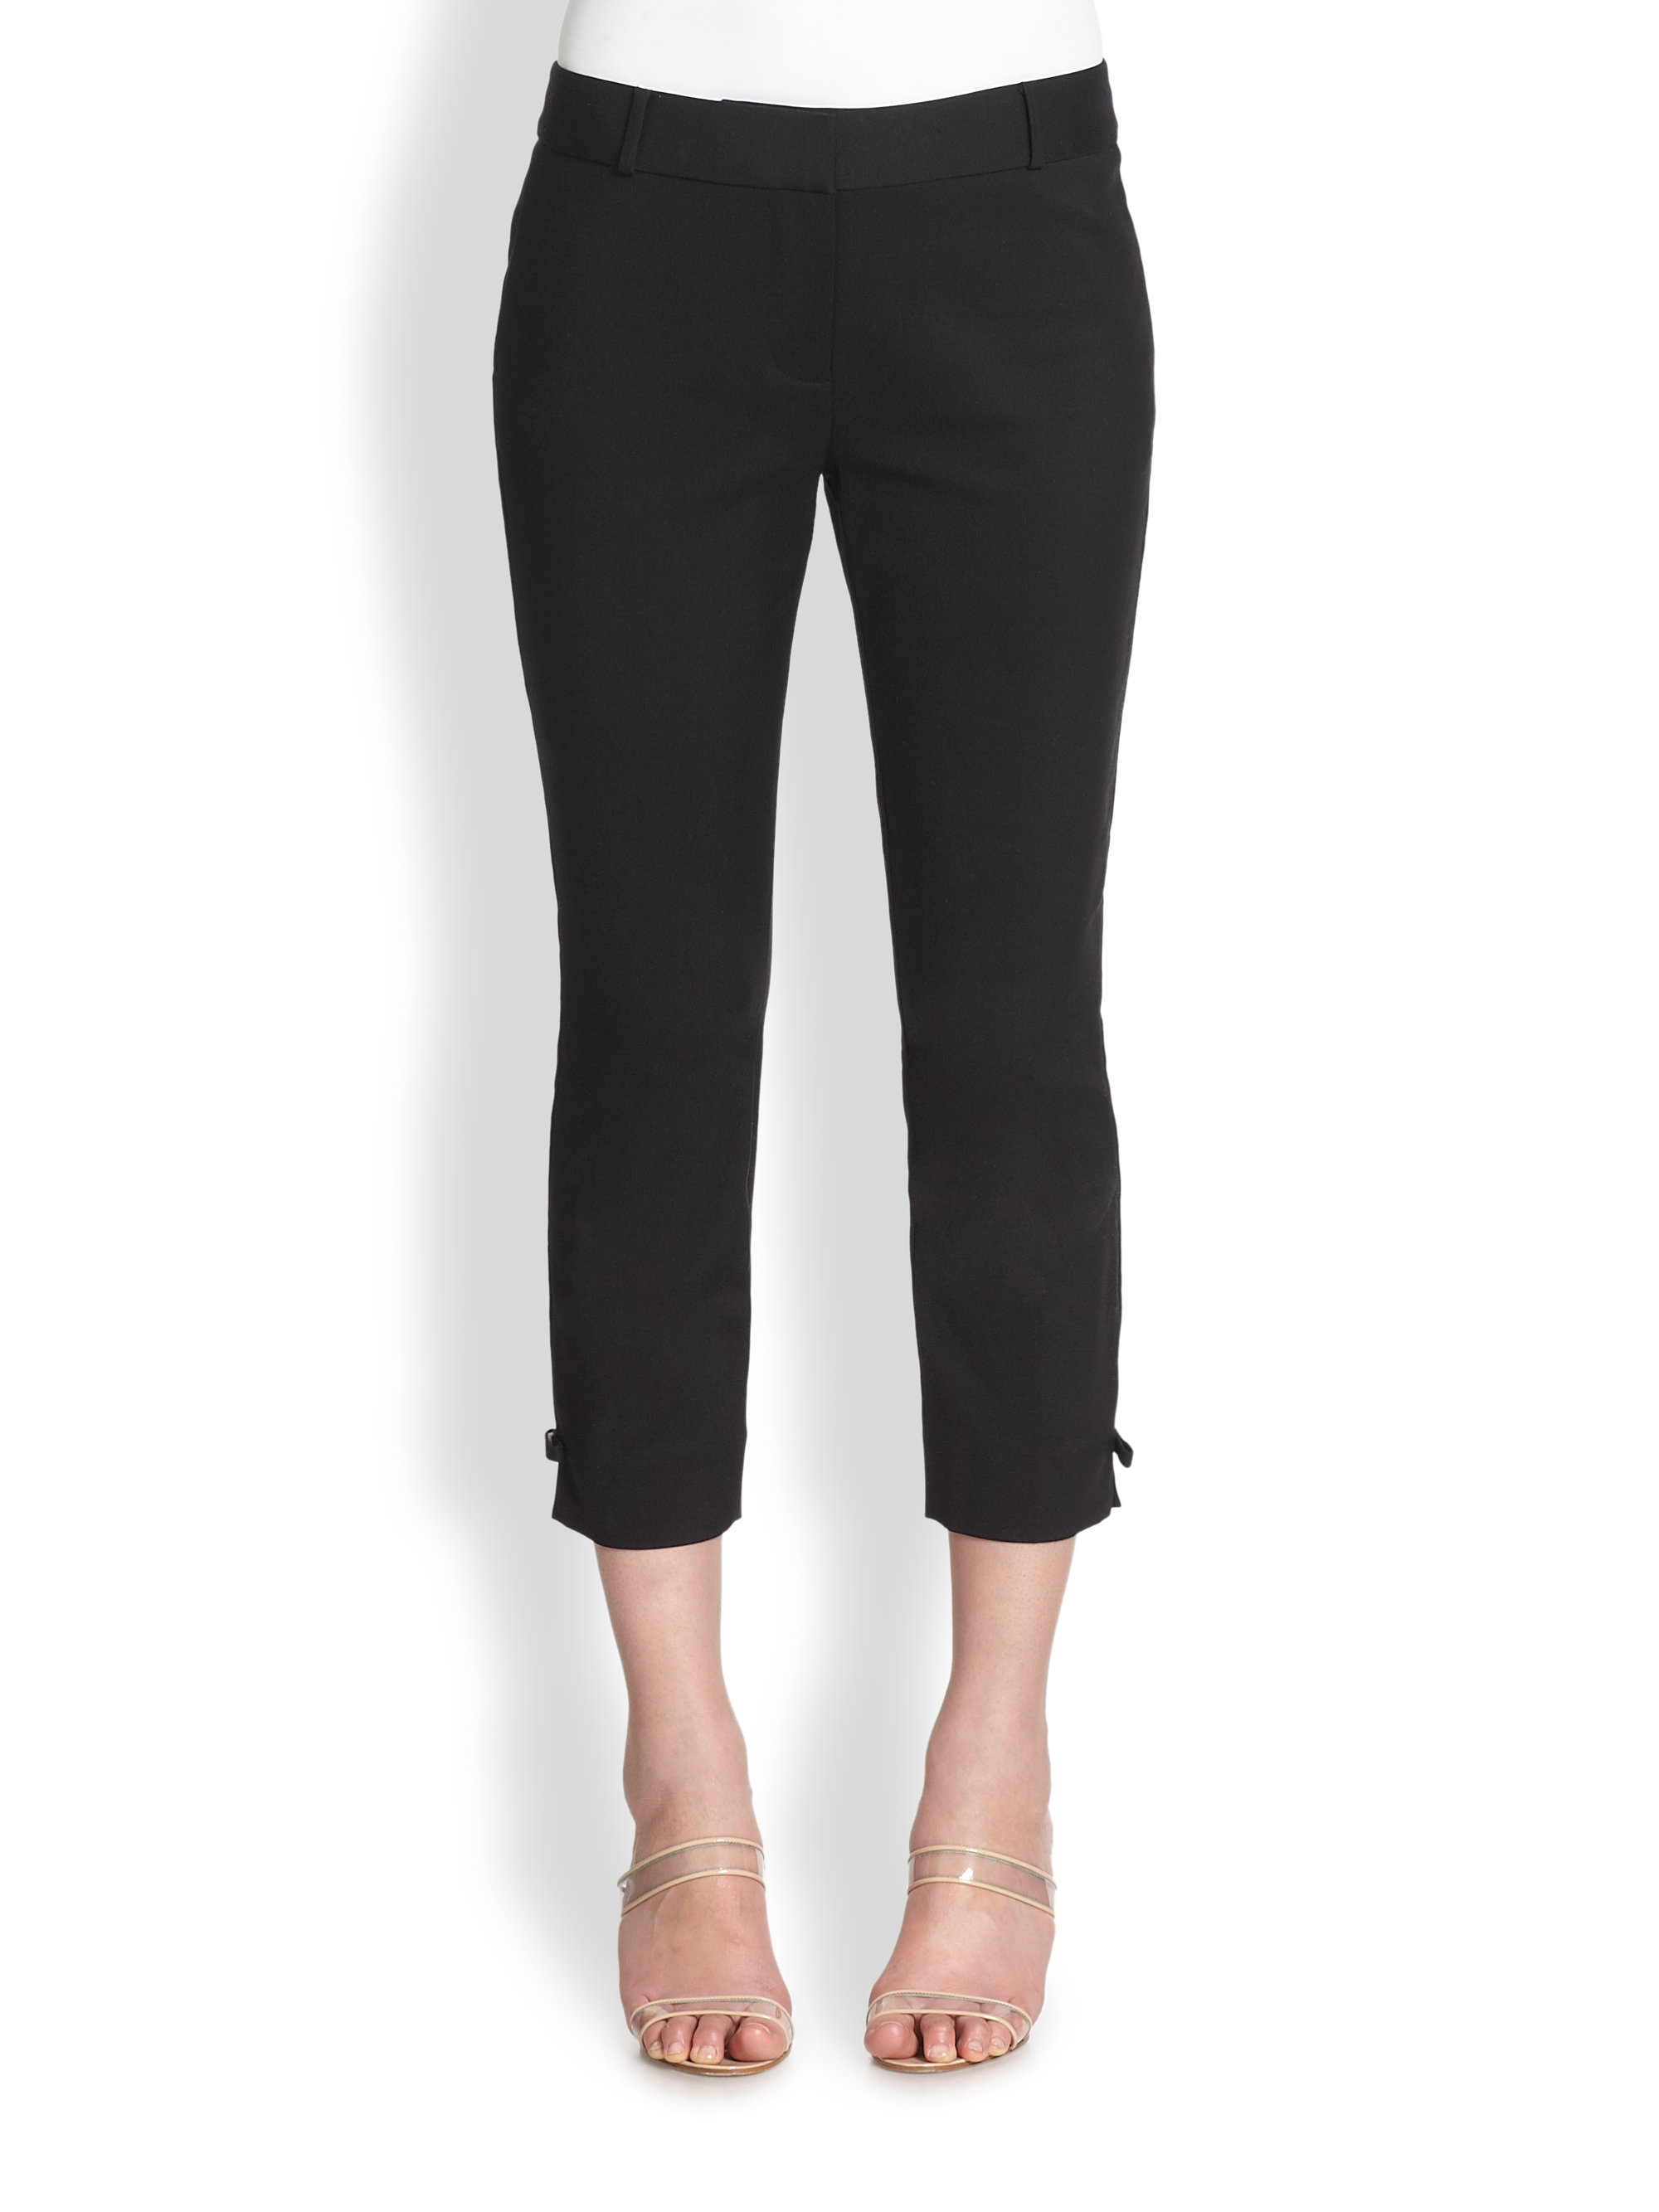 a95e0a1431 Lyst - Kate Spade Jackie Capri Pants in Black